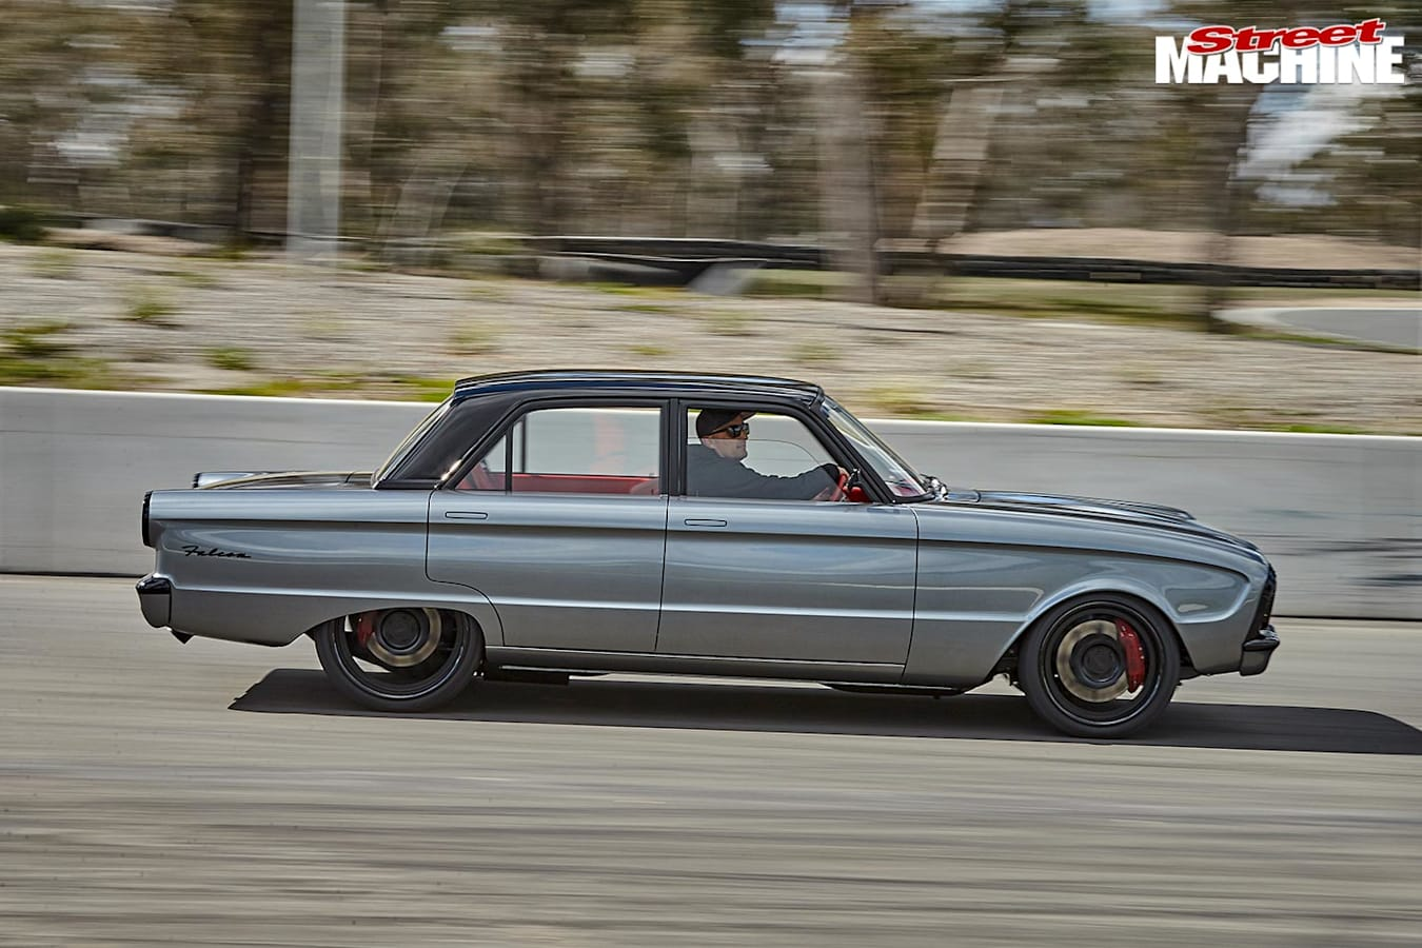 Ford XM Falcon driving